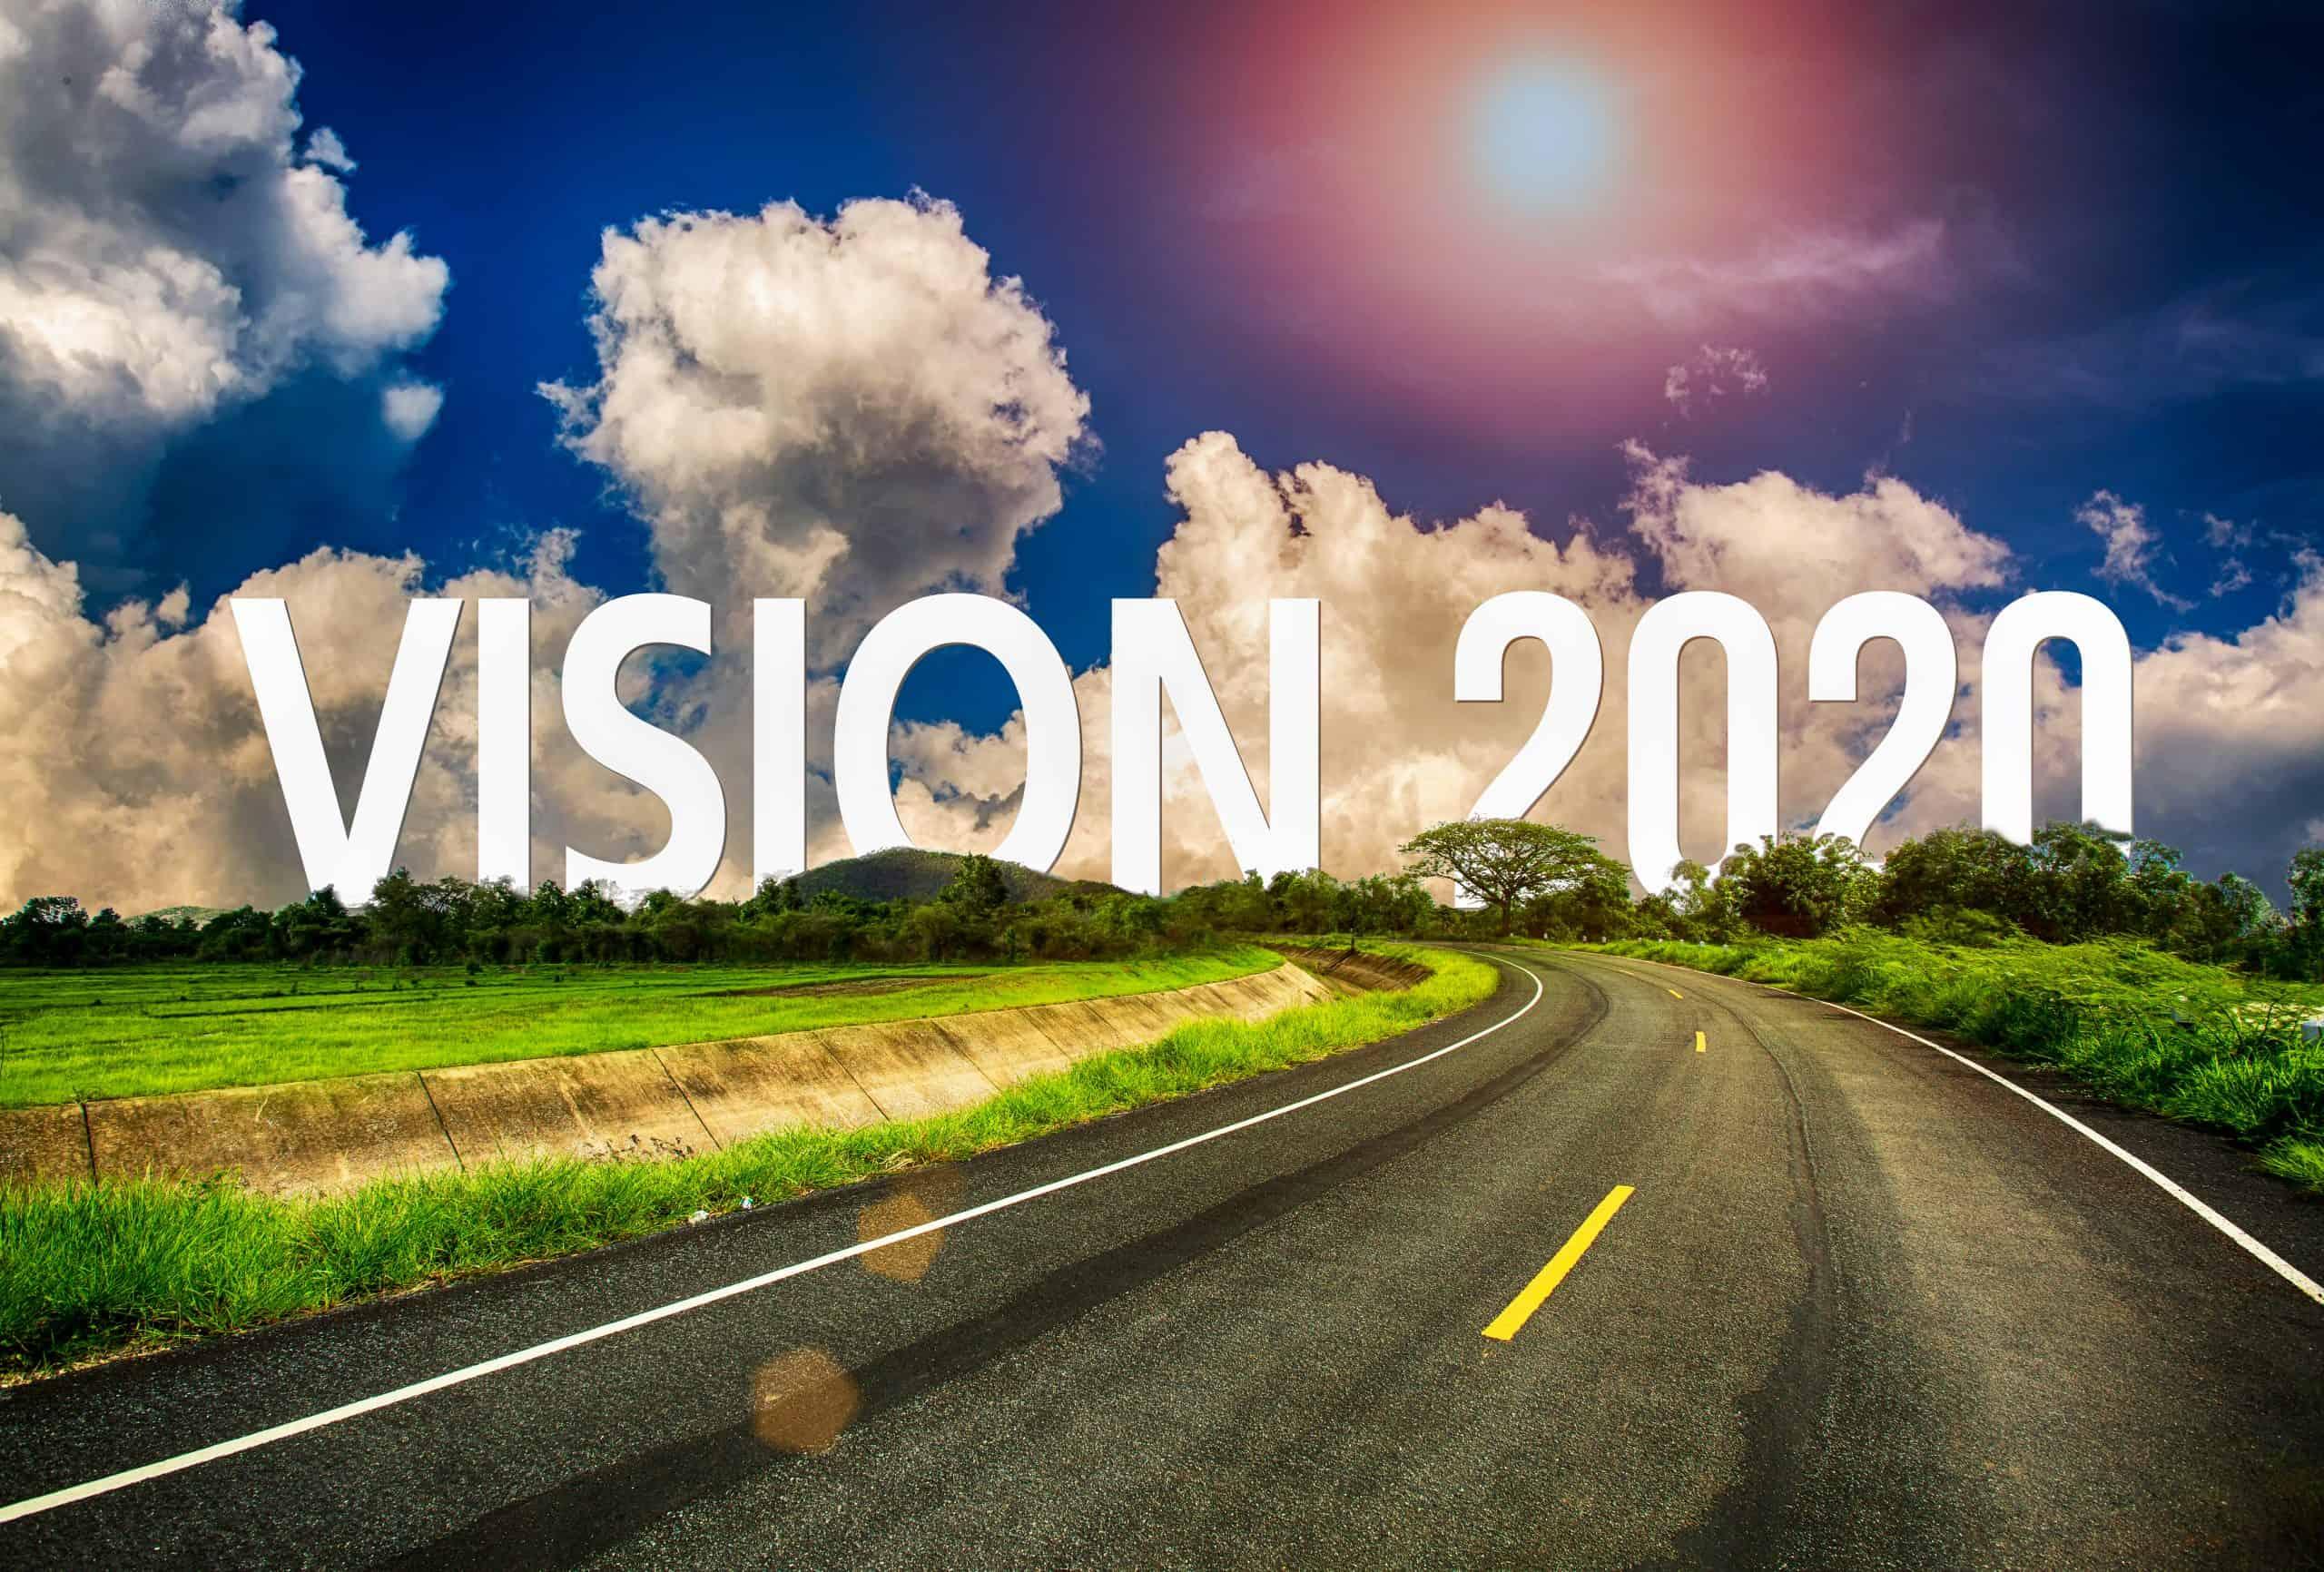 LASIK 2020